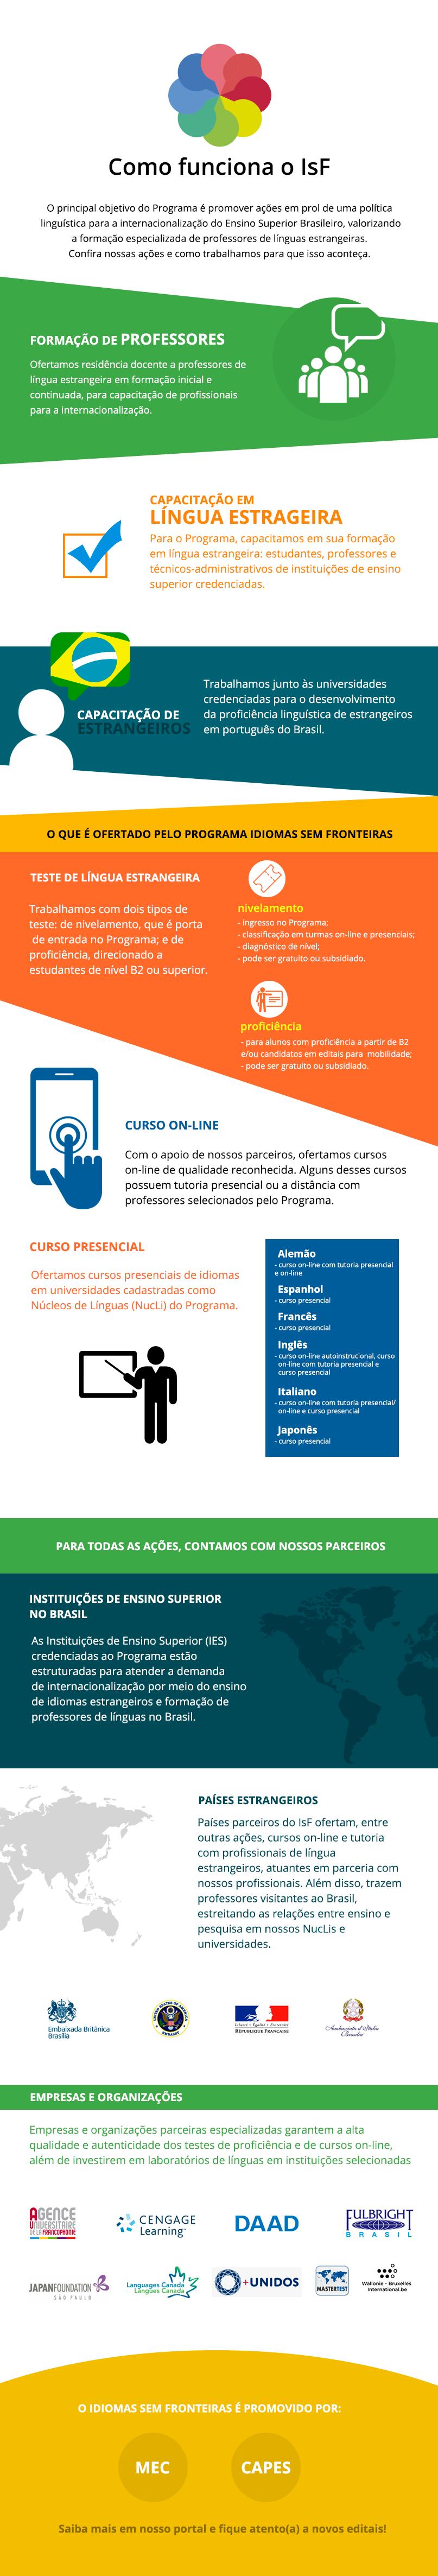 infografico_isf_entenda